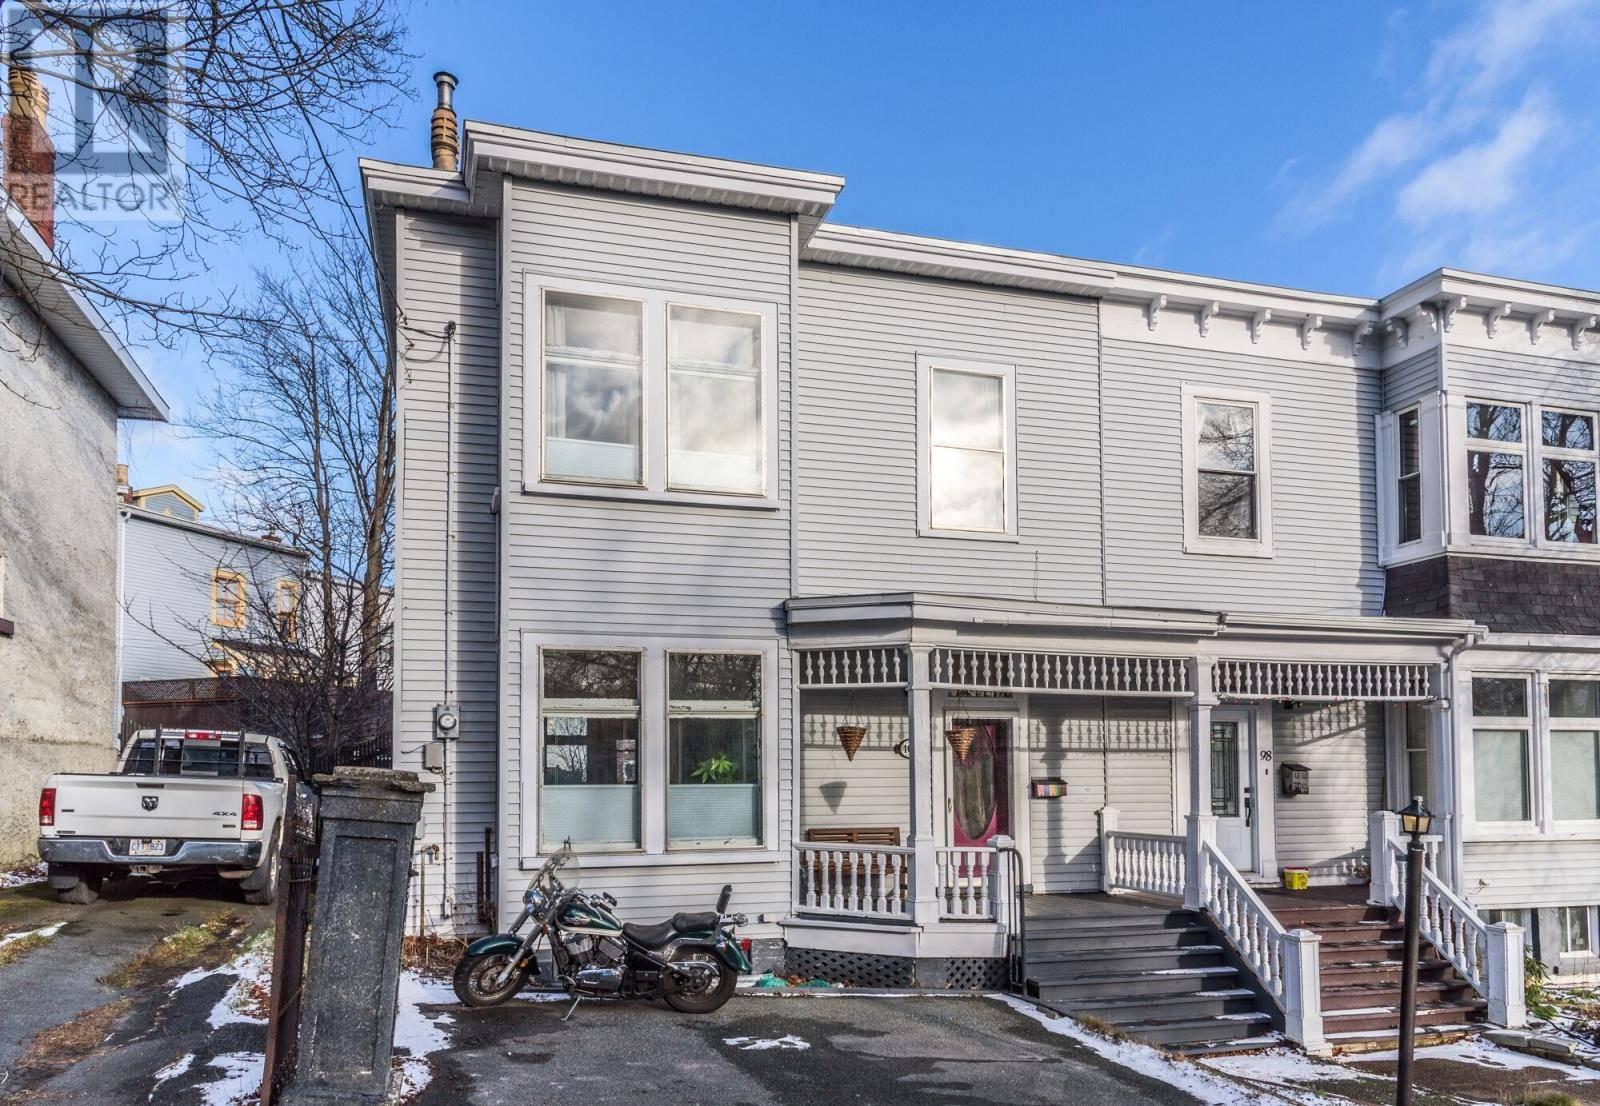 House for sale at 100 Patrick St St. John's Newfoundland - MLS: 1209050